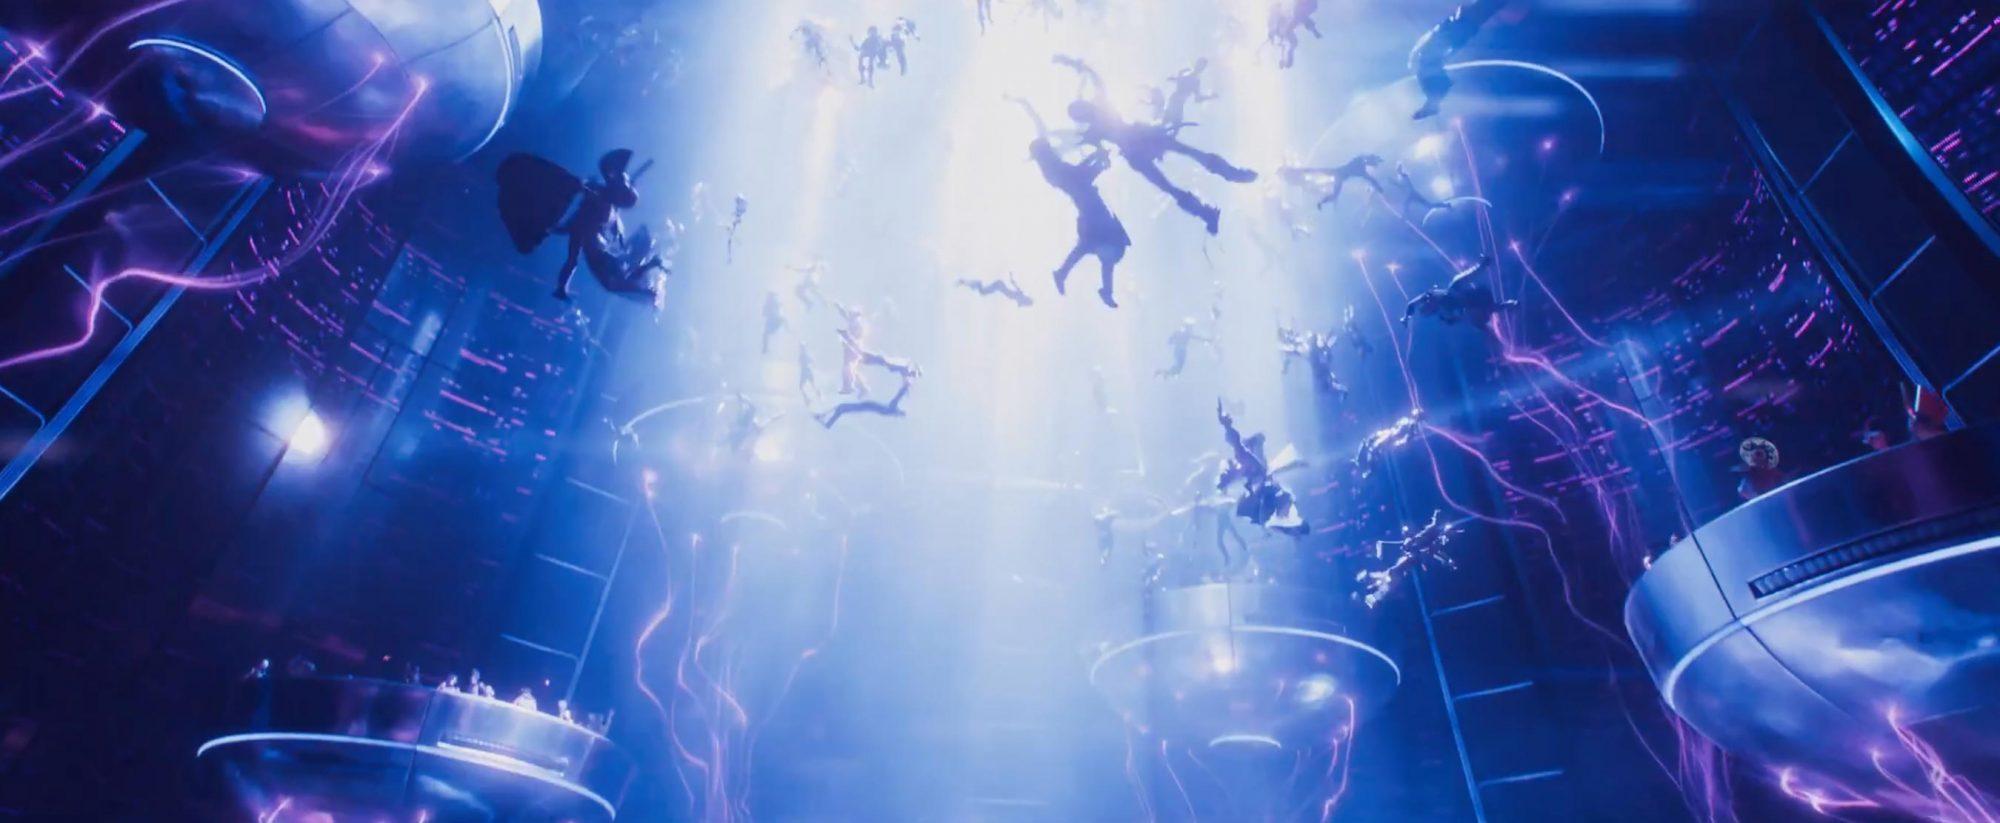 RPO - SDCC Teaser [HD] trailer (screen grab) CR: Warner Bros. Pictures